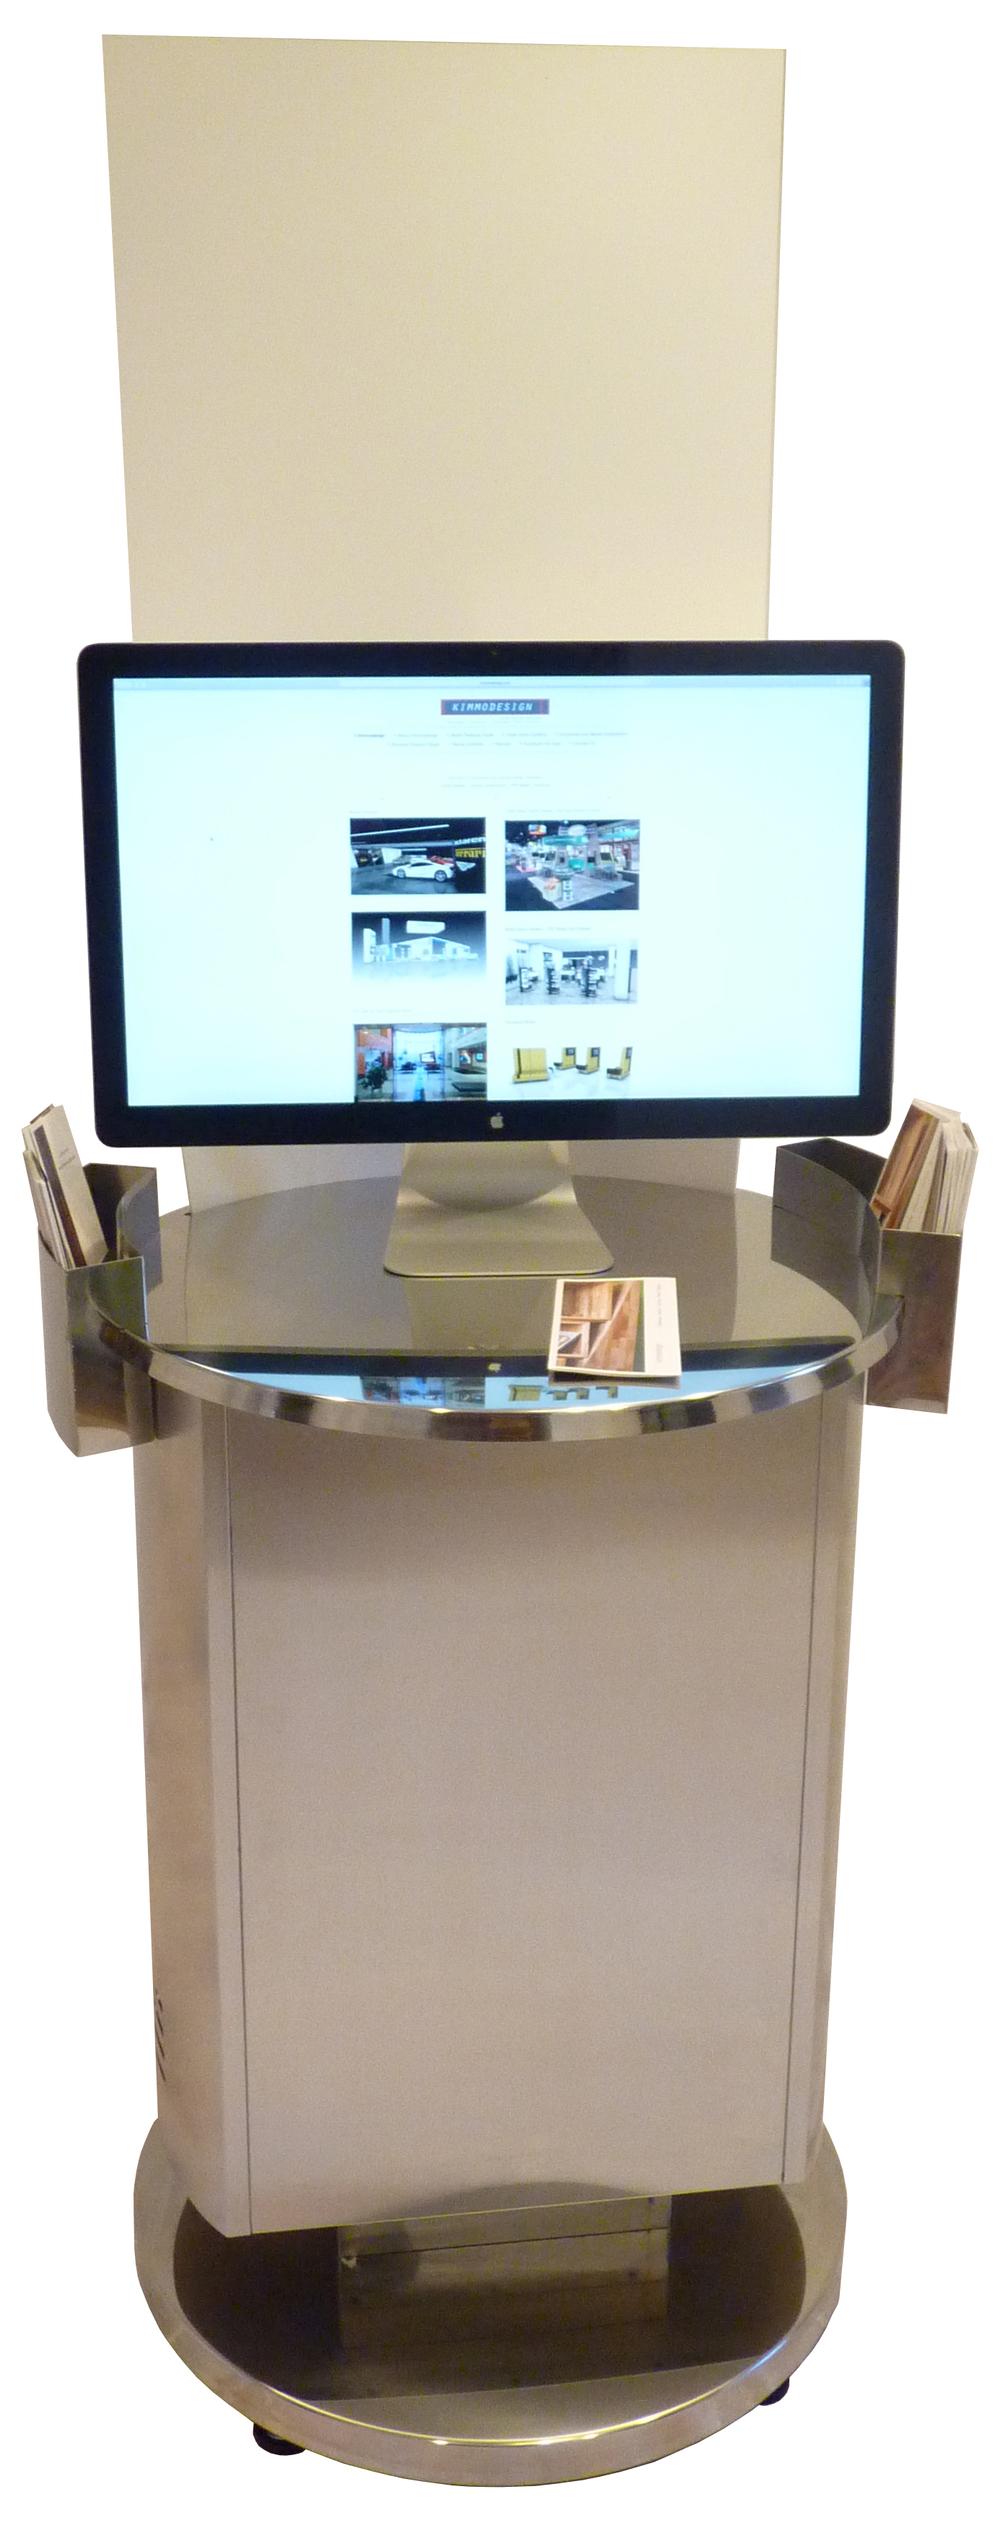 Retail Pedestal Kiosk